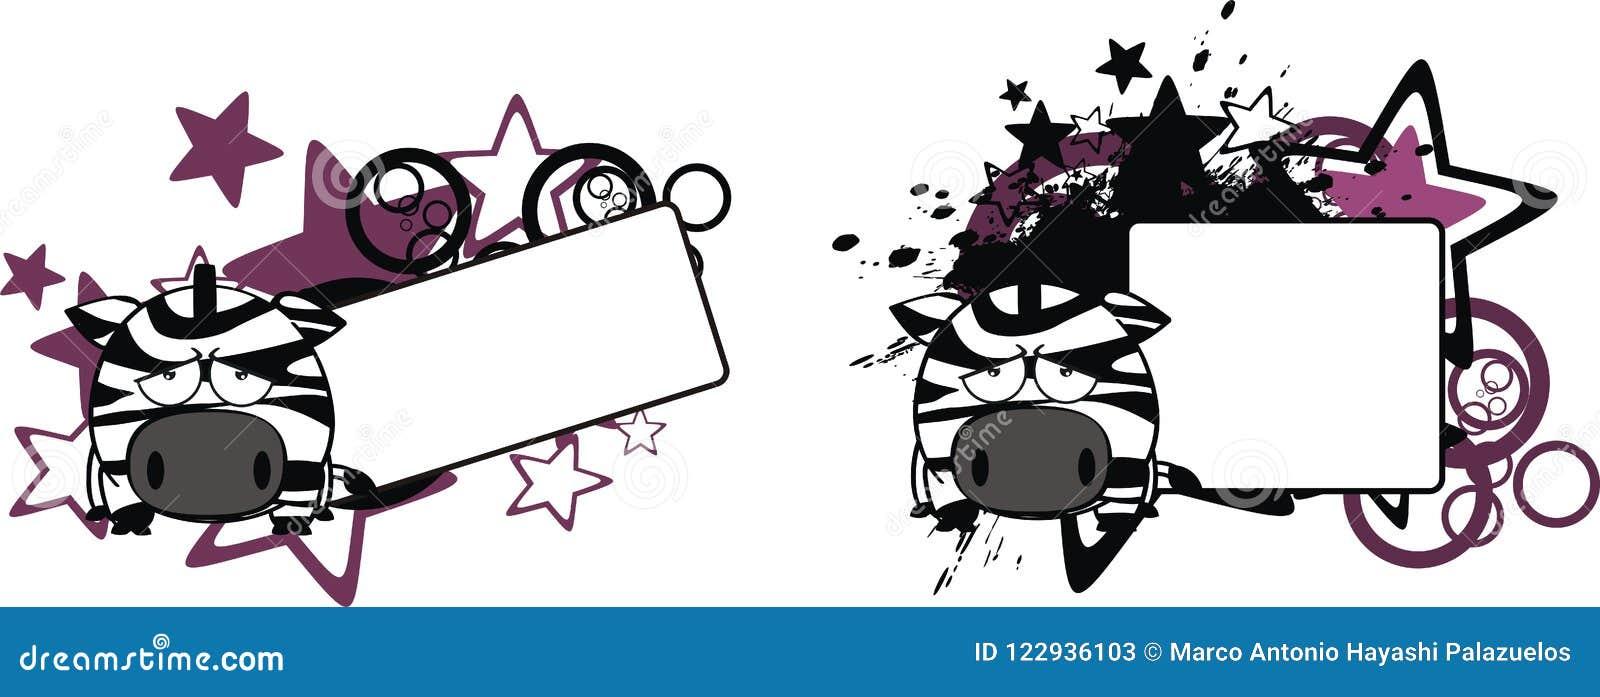 Sad Little Zebra Cartoon Copy Space Stock Vector Illustration Of